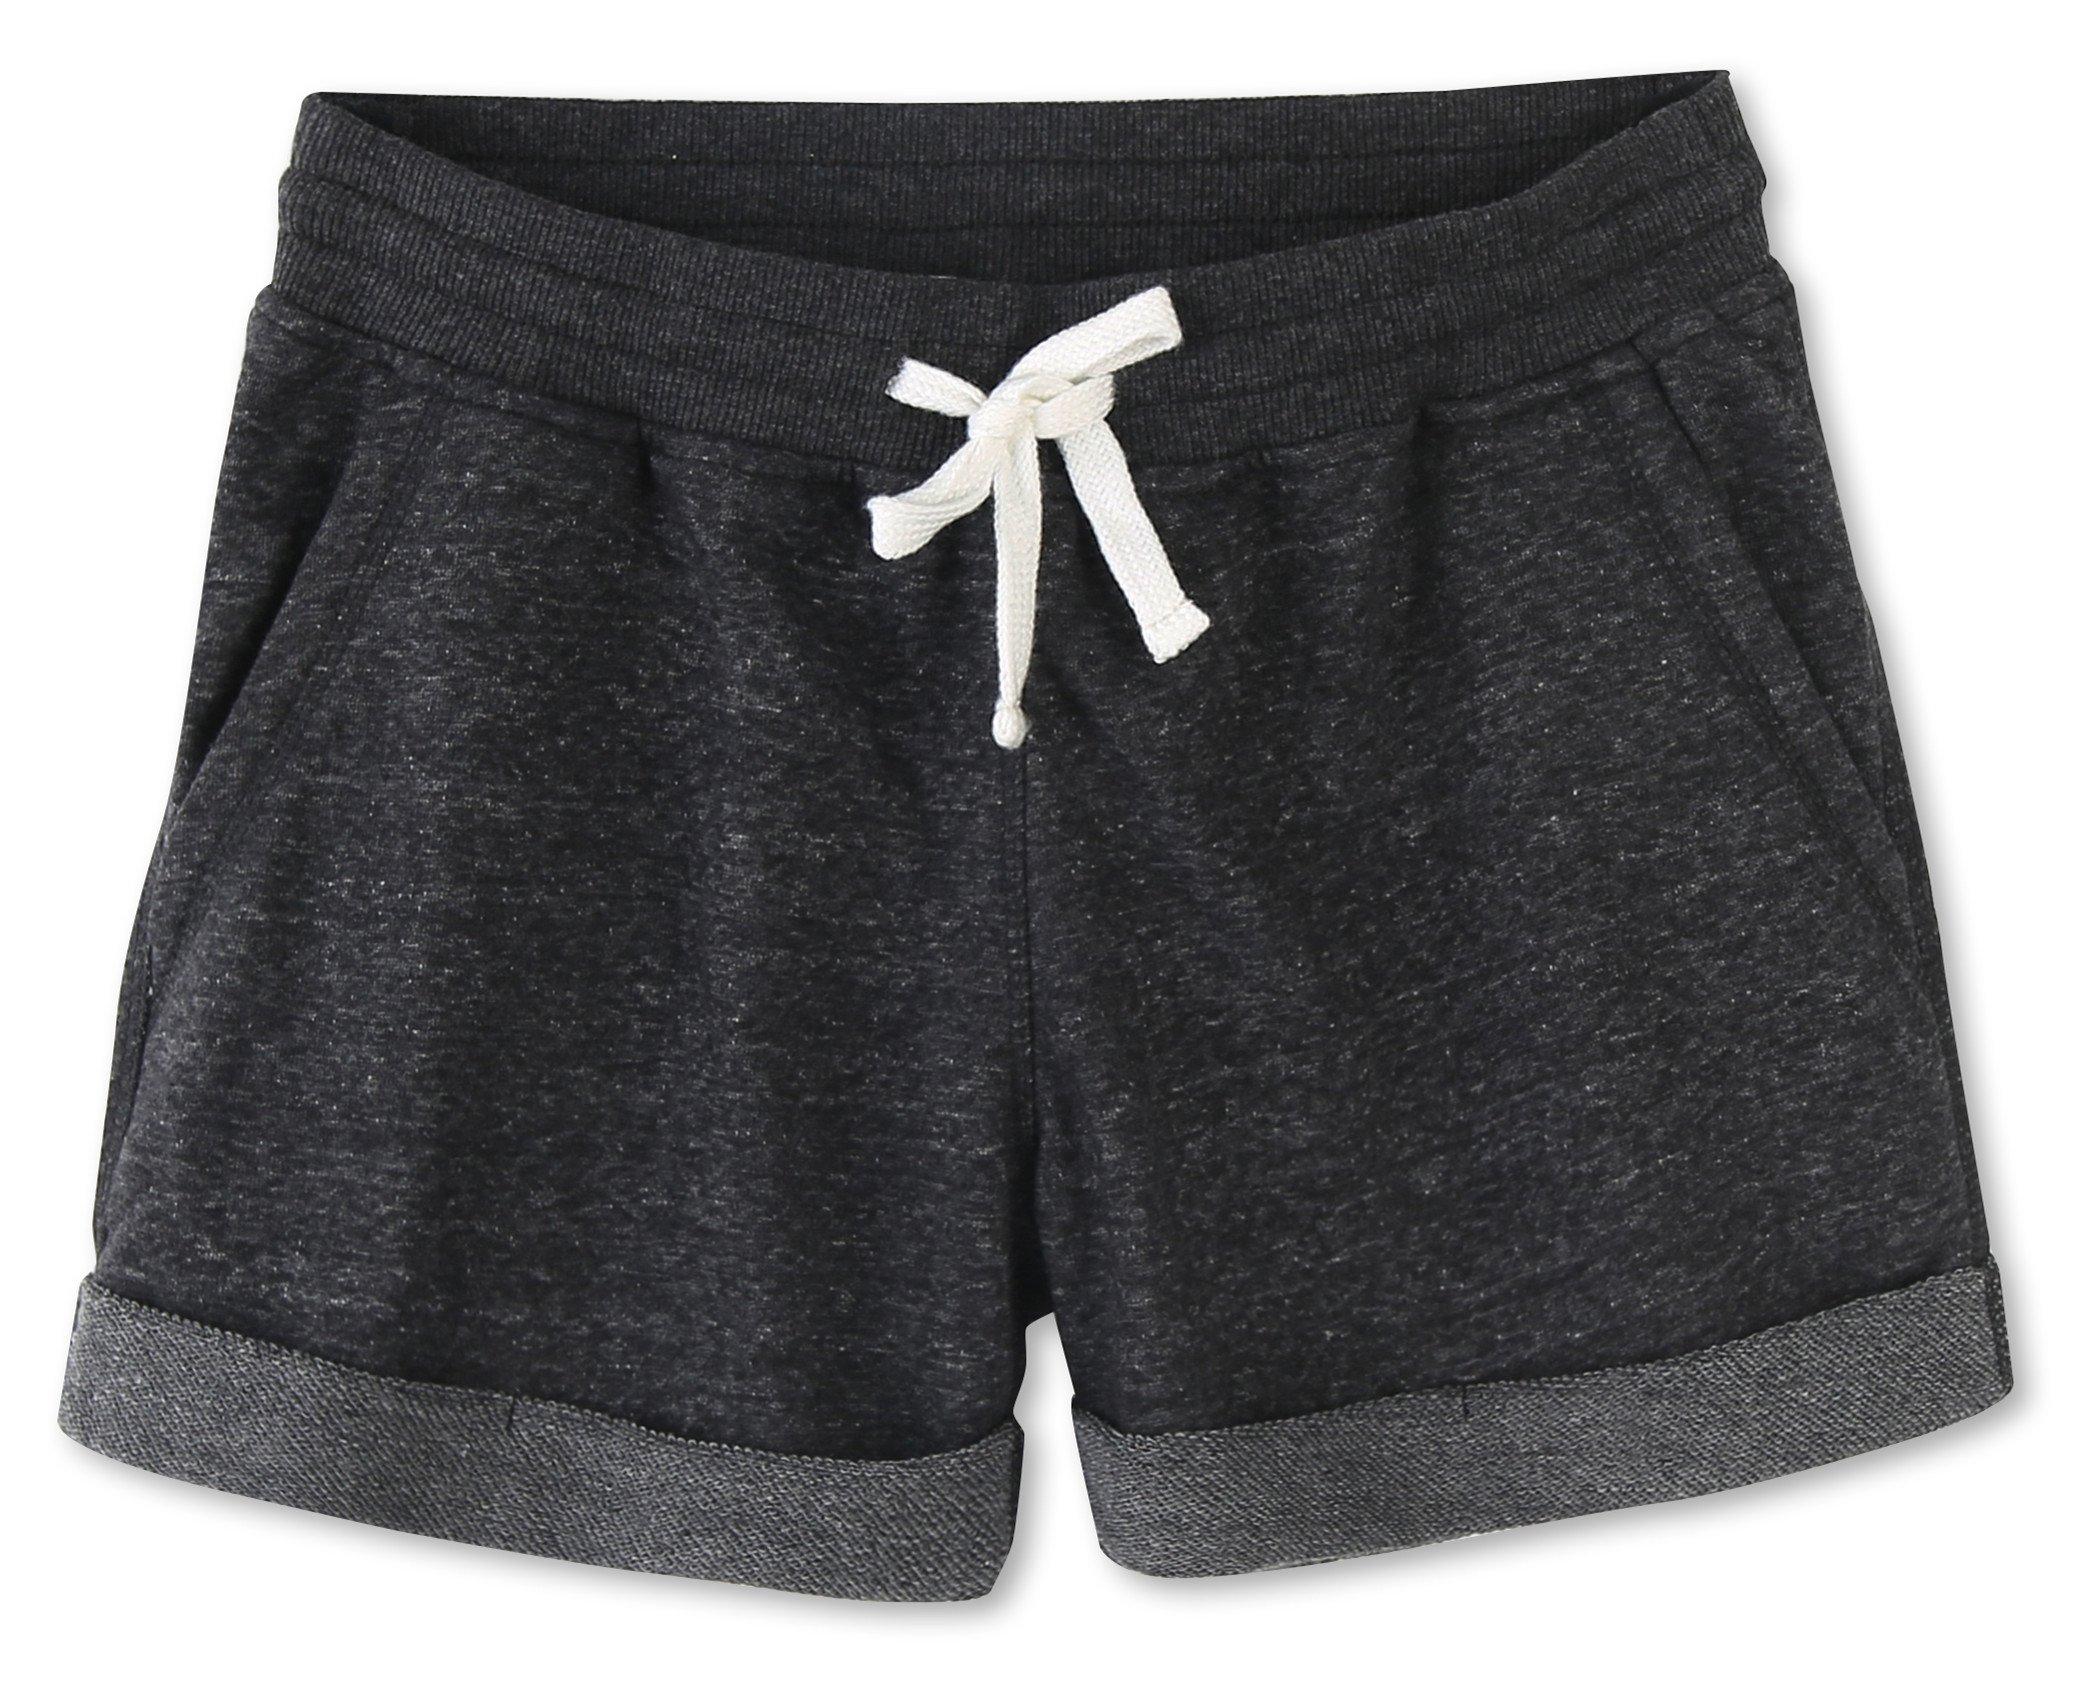 Vetemin Women's Juniors Cotton Stretch Activewear Lounge Shorts Black Melange XL